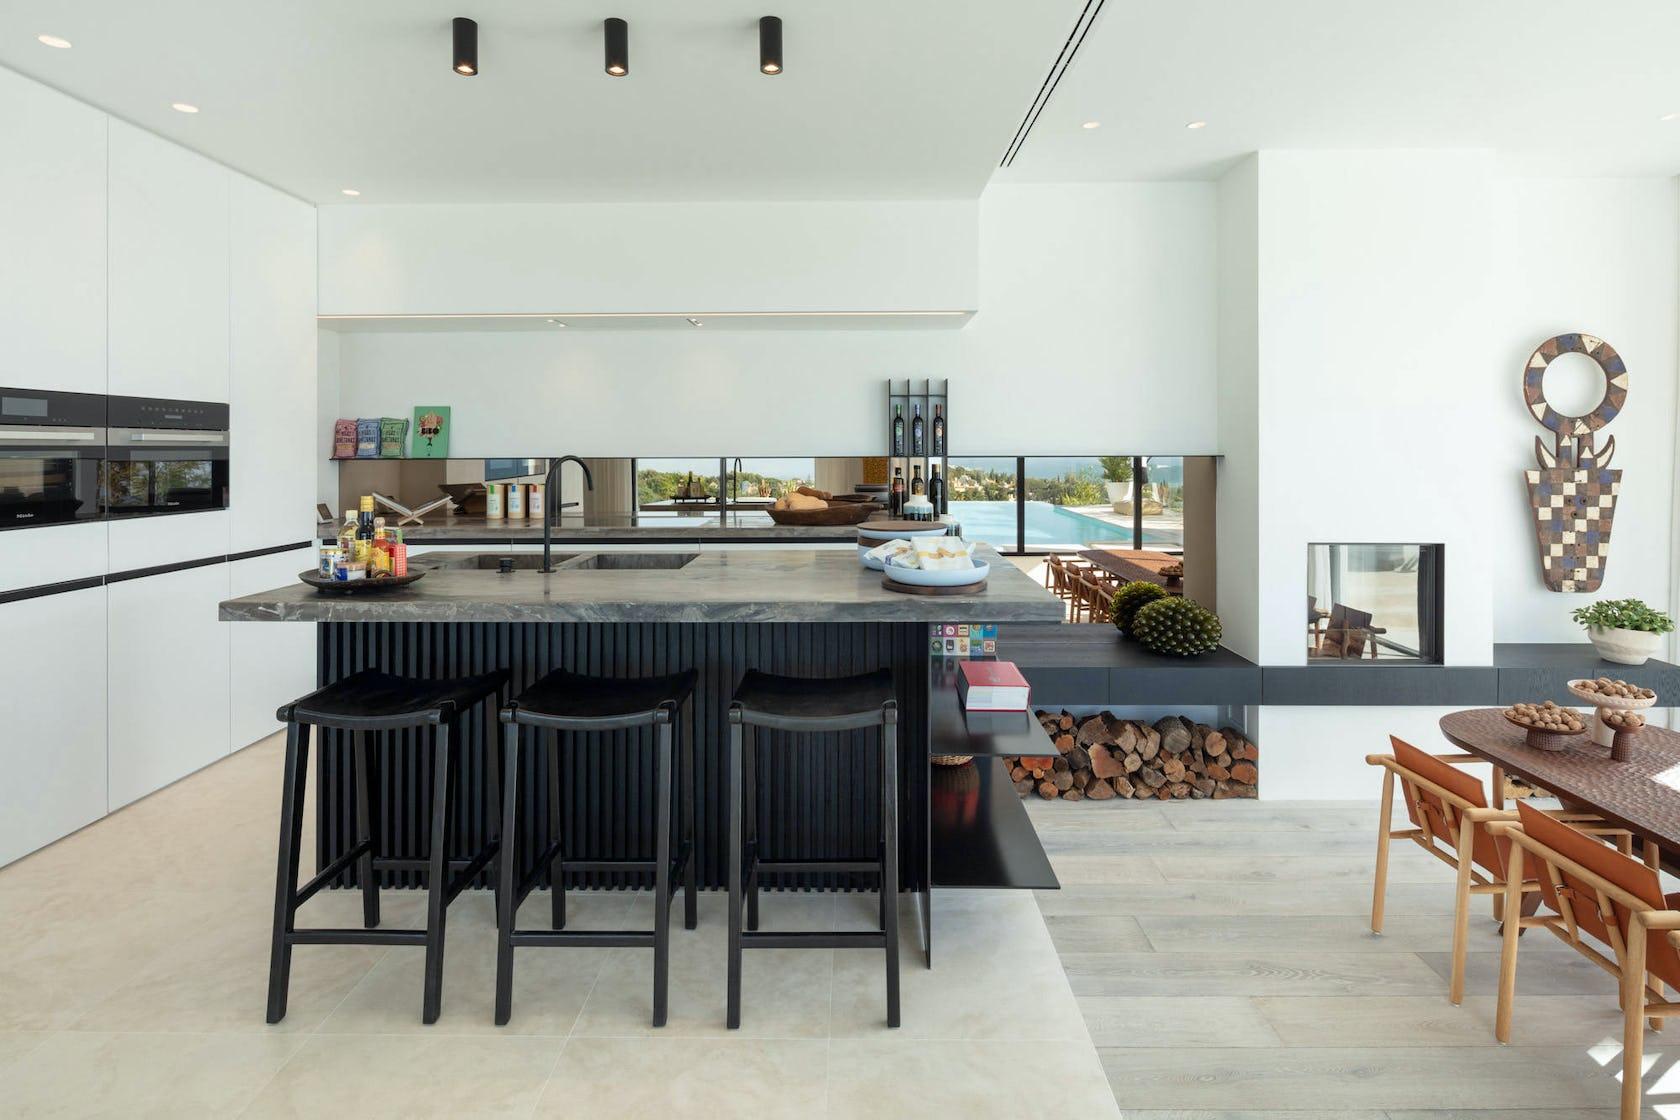 indoors room furniture kitchen island kitchen